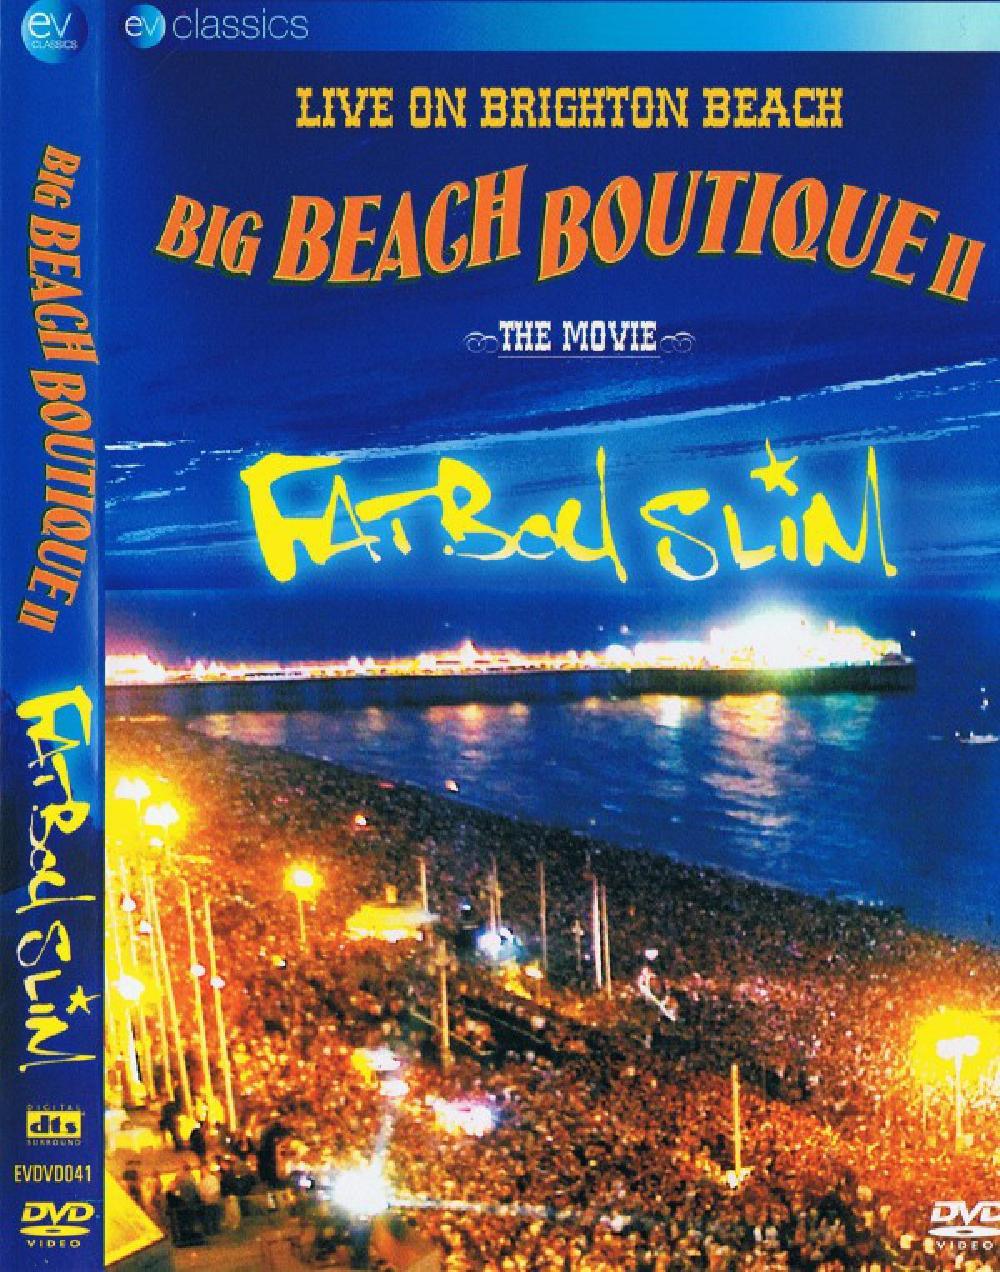 FATBOY SLIM - Big Beach Boutique II - The Movie - DVD